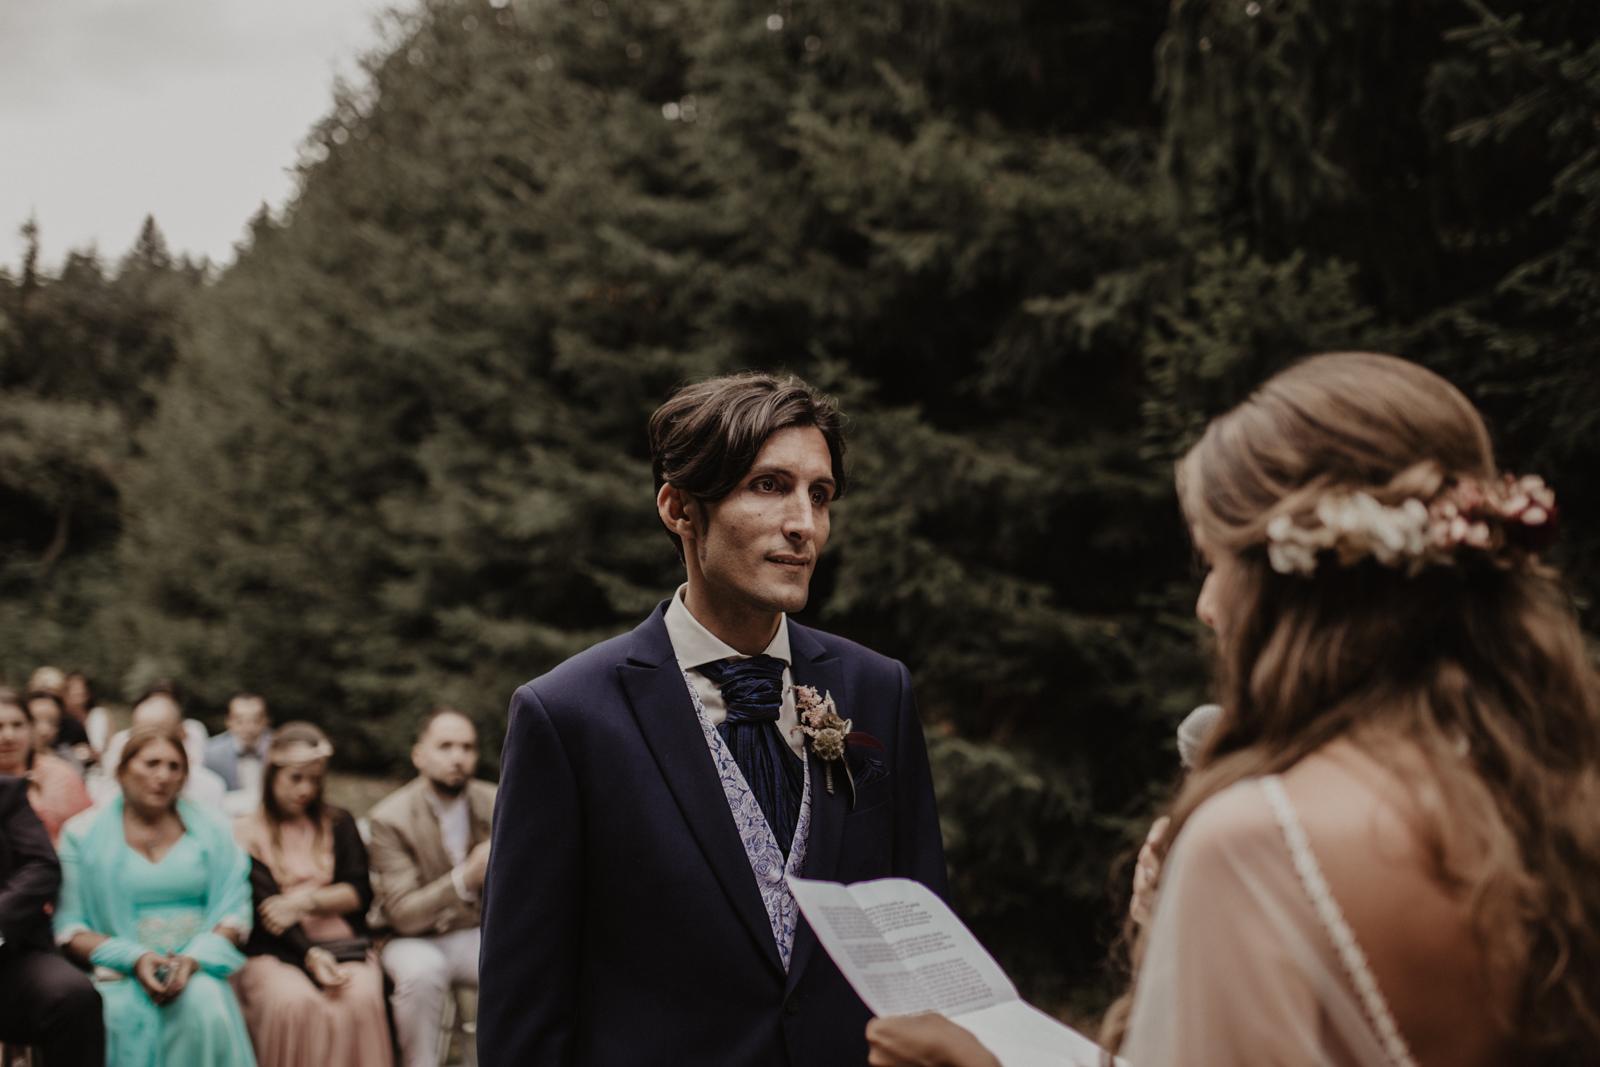 thenortherngirlphotography_photography_thenortherngirl_rebeccascabros_wedding_weddingphotography_weddingphotographer_barcelona_bodaenbarcelona_bodaenmaselmarti_bodarogeryvane-451.jpg